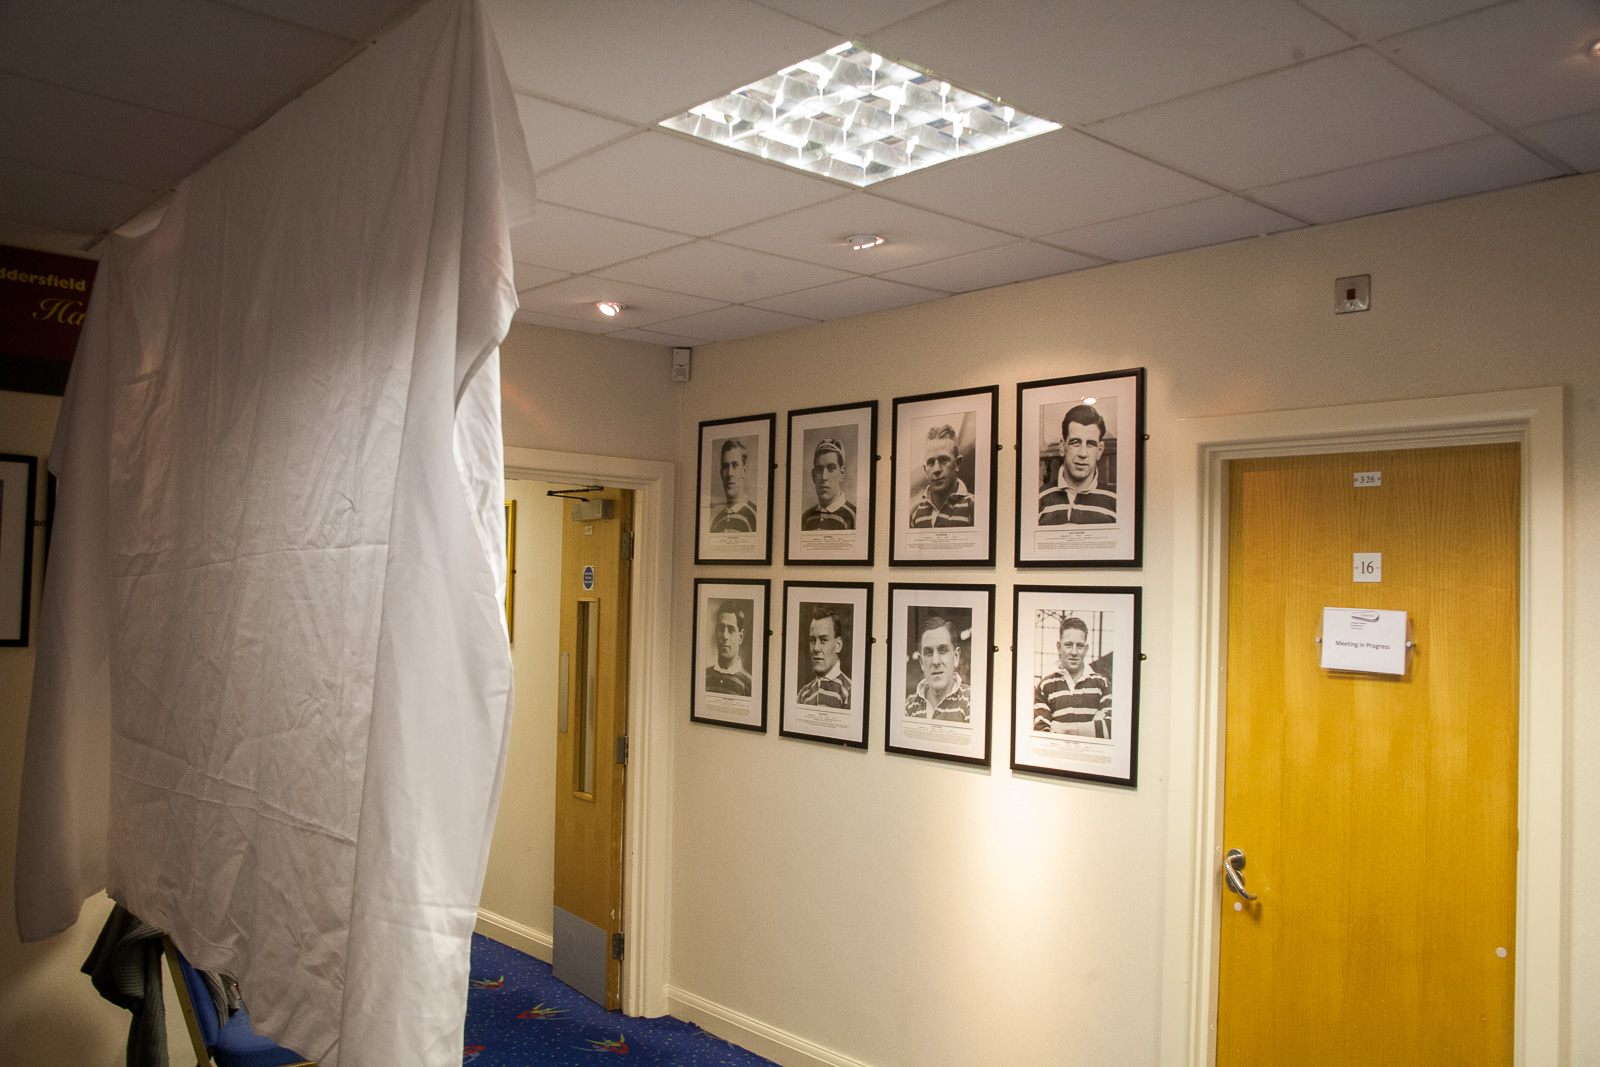 Hall_Of_Fame_Corridor_003.jpg